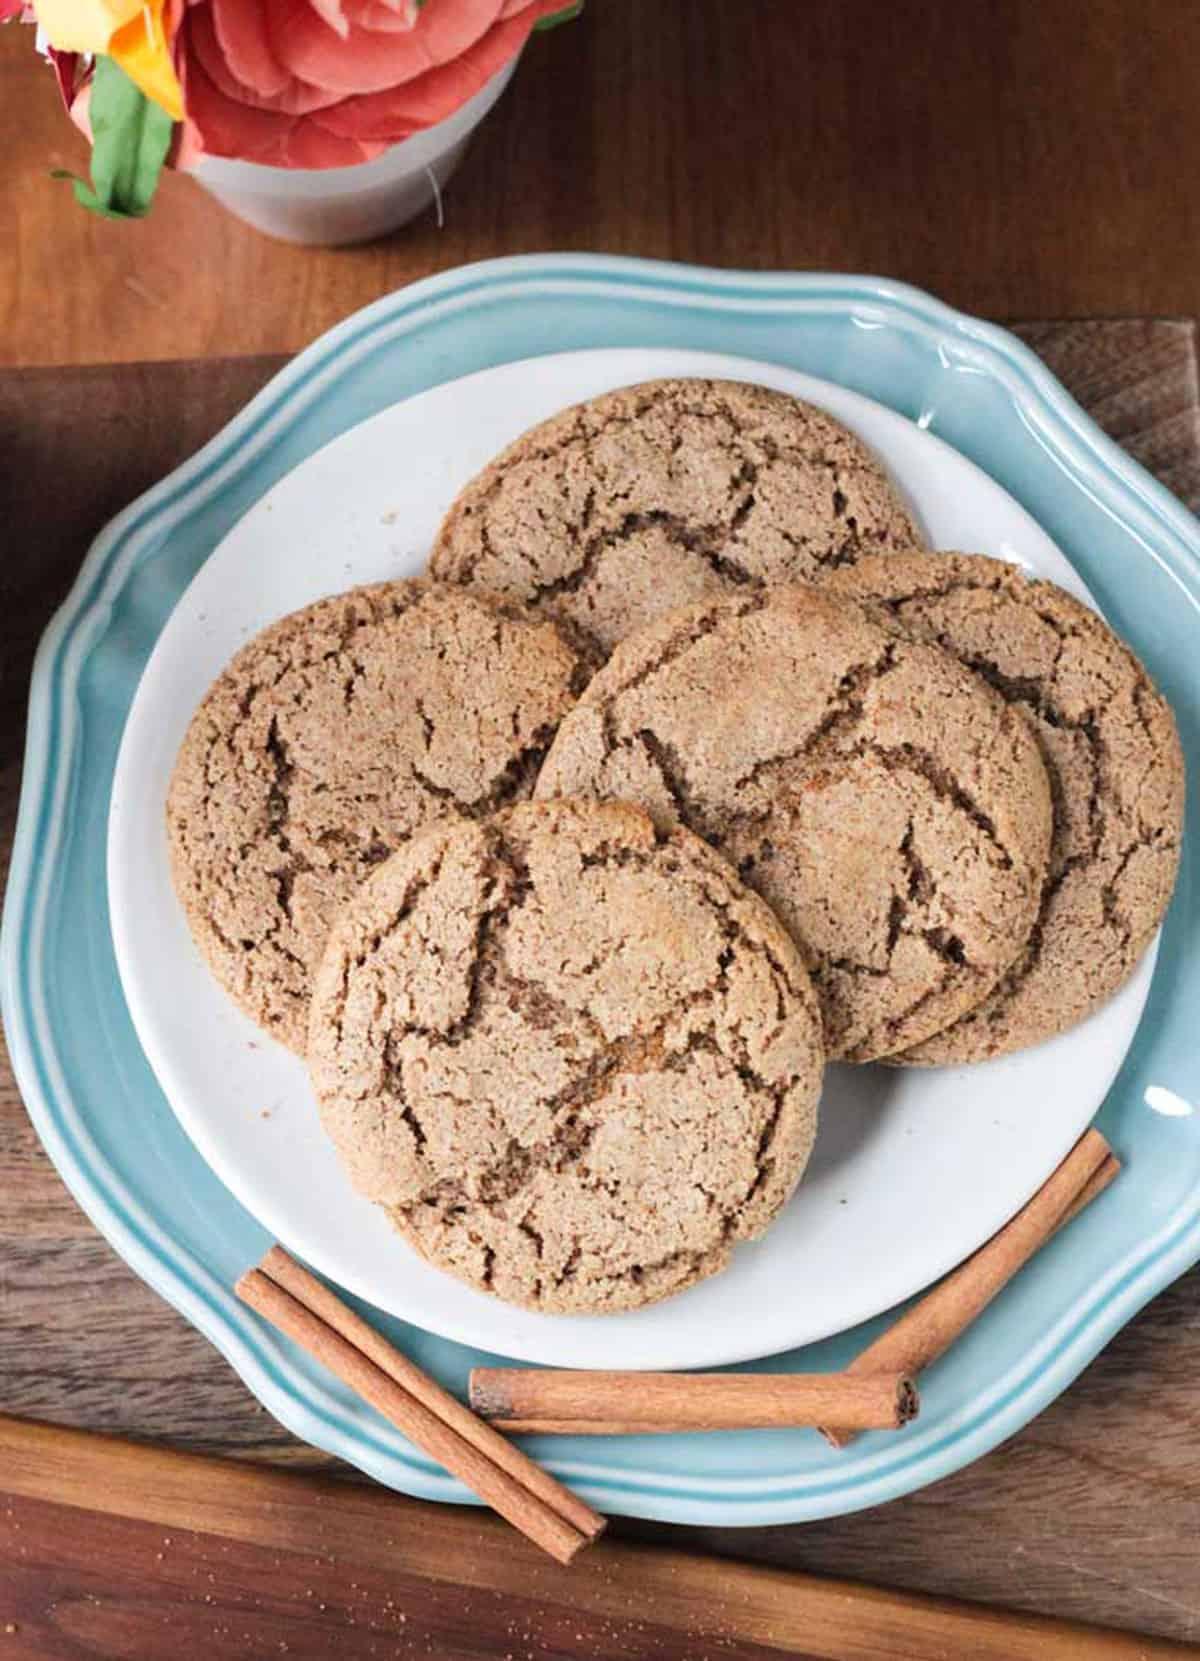 A pile of Vegan Cinnamon Cookies on a plate.